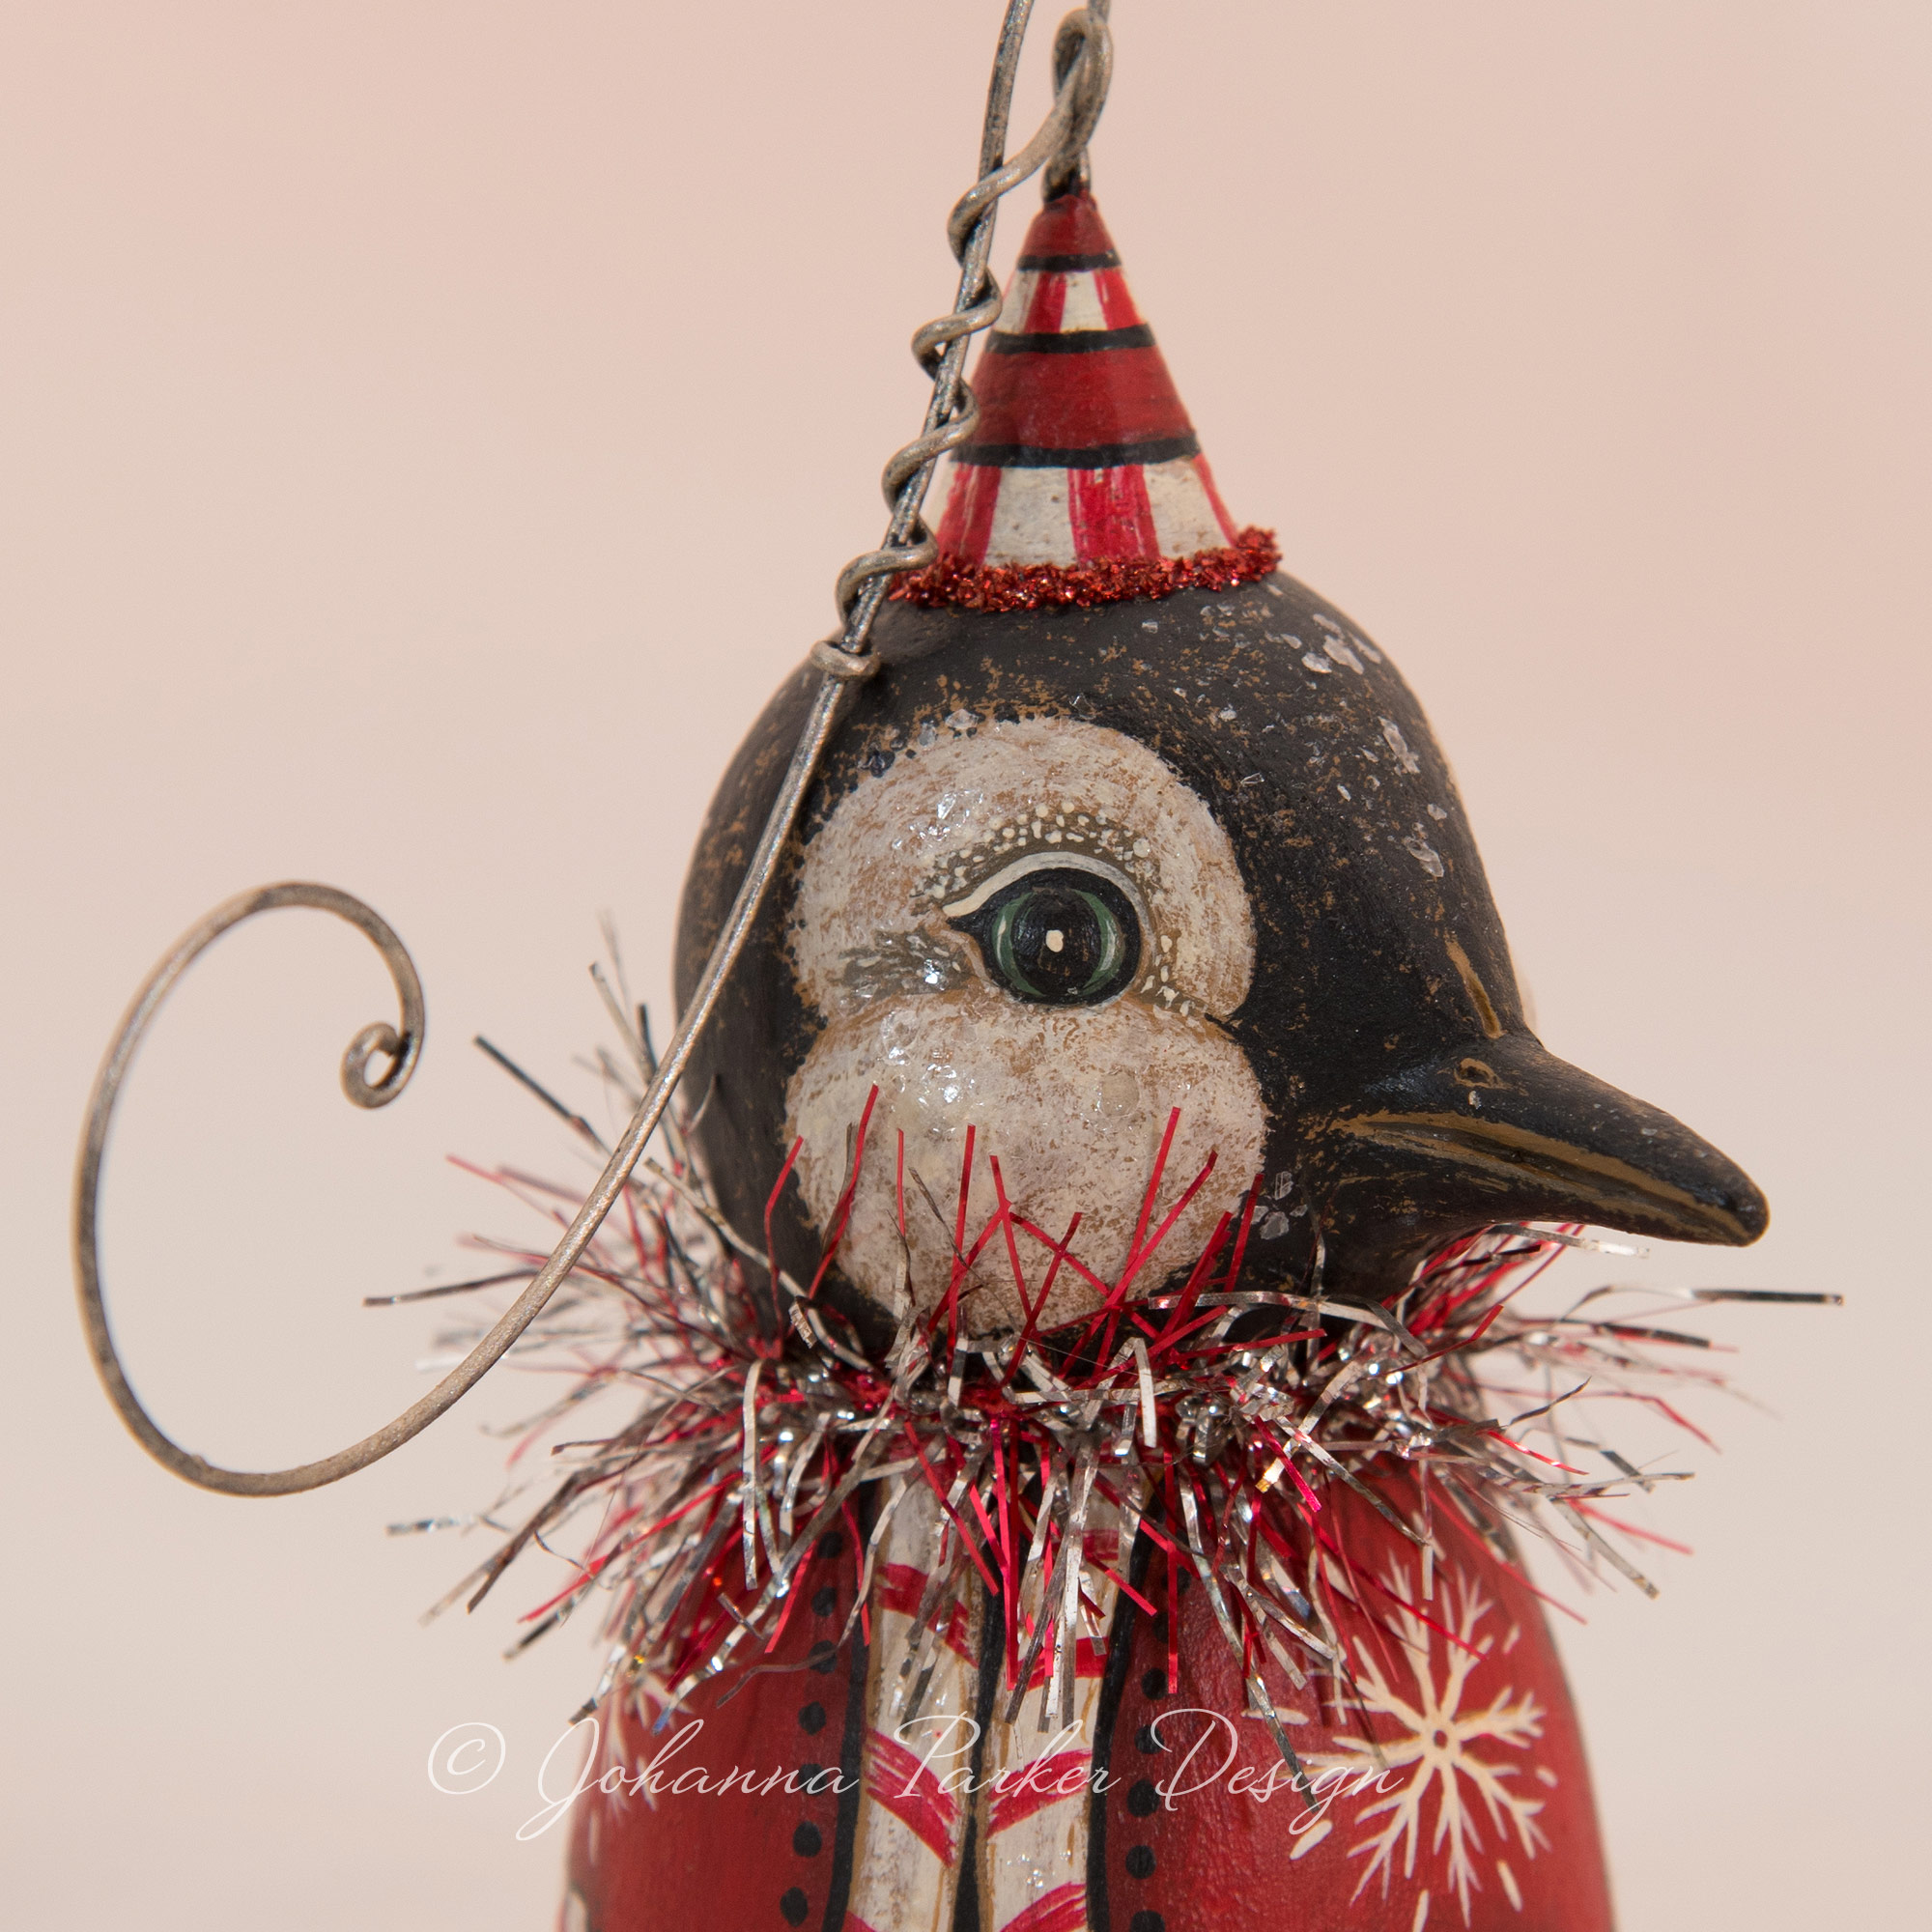 Johanna-Parker-Penguin-Ornament-Bell-1.jpg